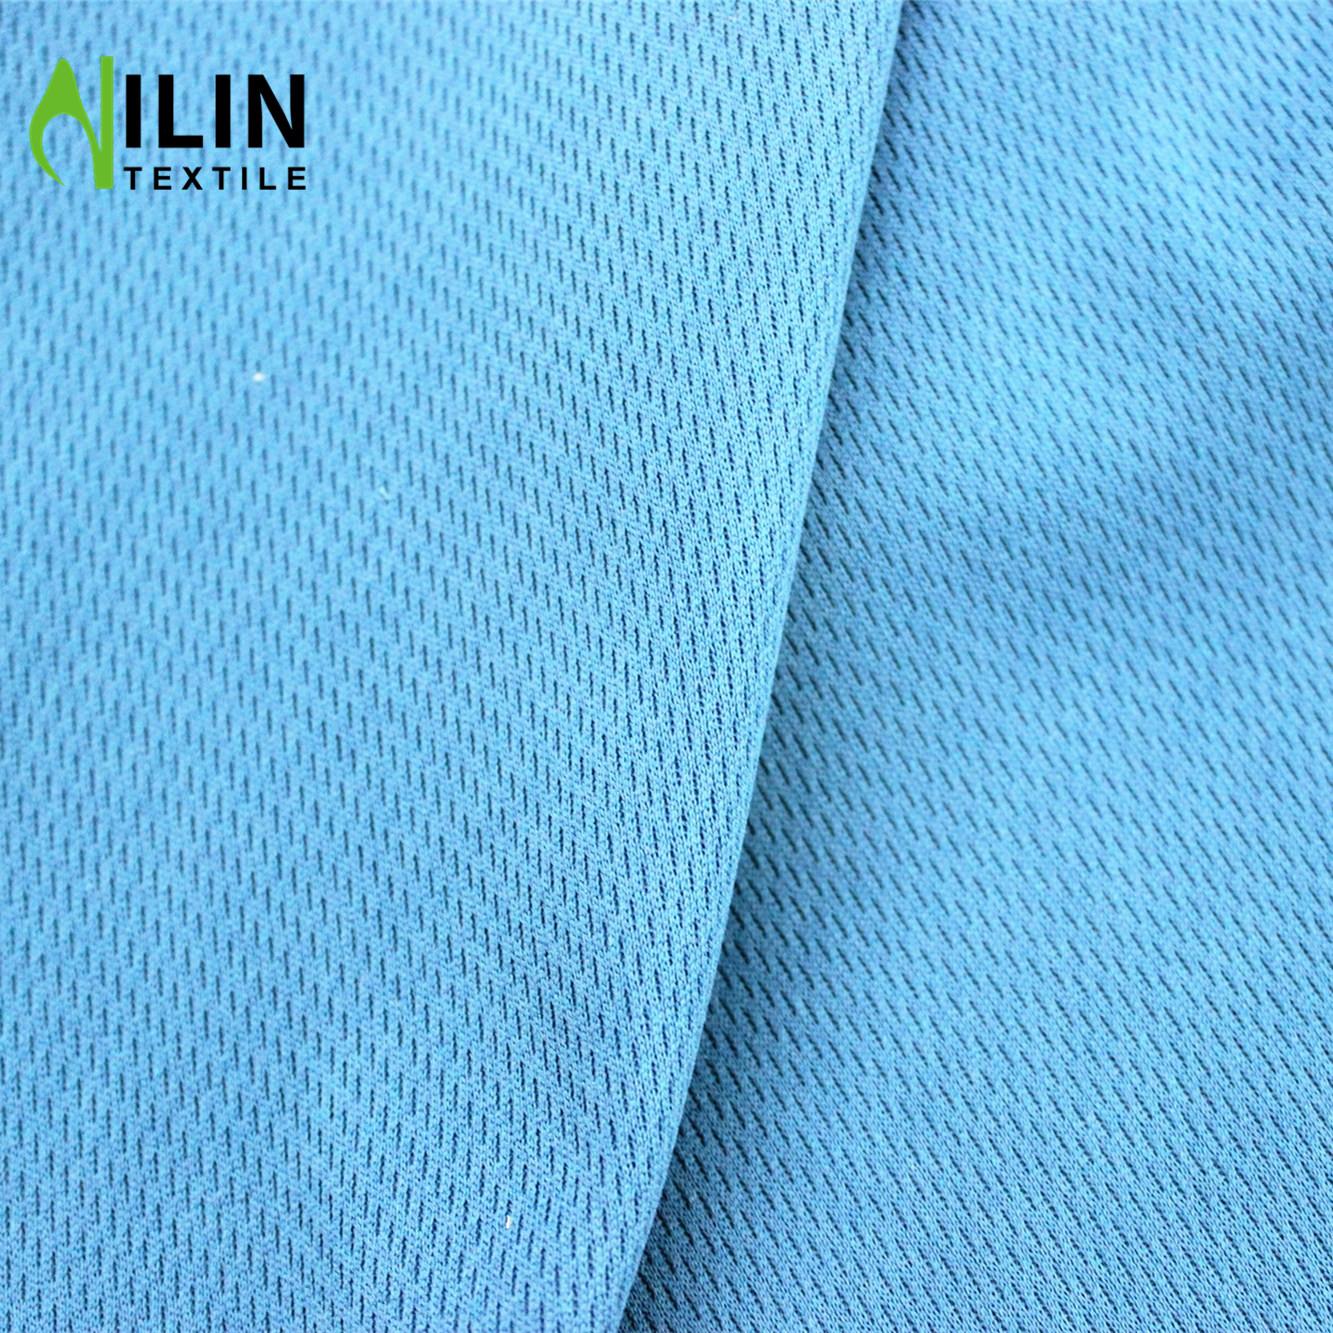 Dri fit 100% polyester fabric bird eye mesh fabric for sportswear